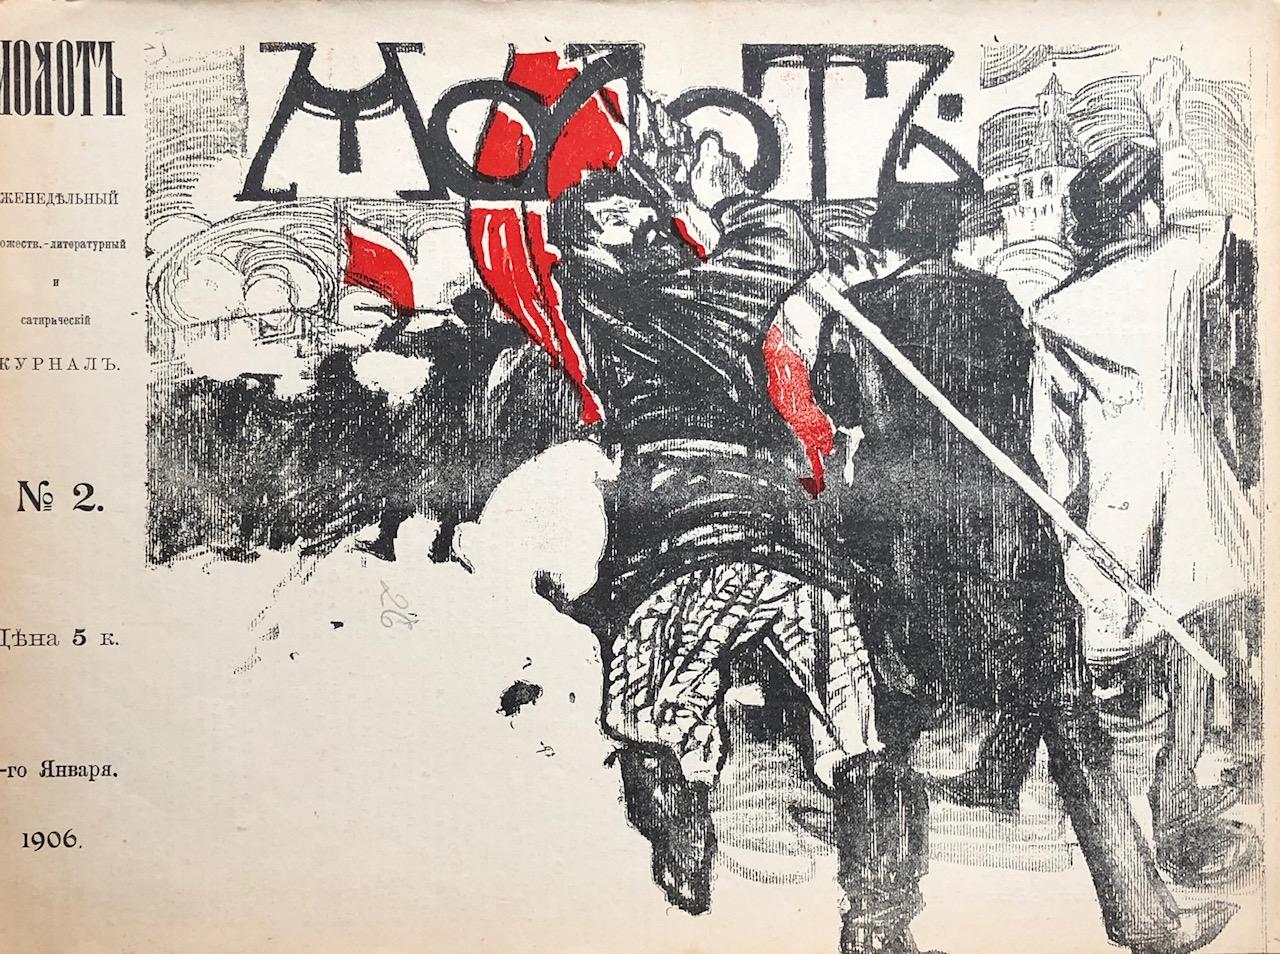 Lot 490 - Le marteau. Молот. 1905 г., № 1; 1906 г., № 2. Редактор К. И. [...]